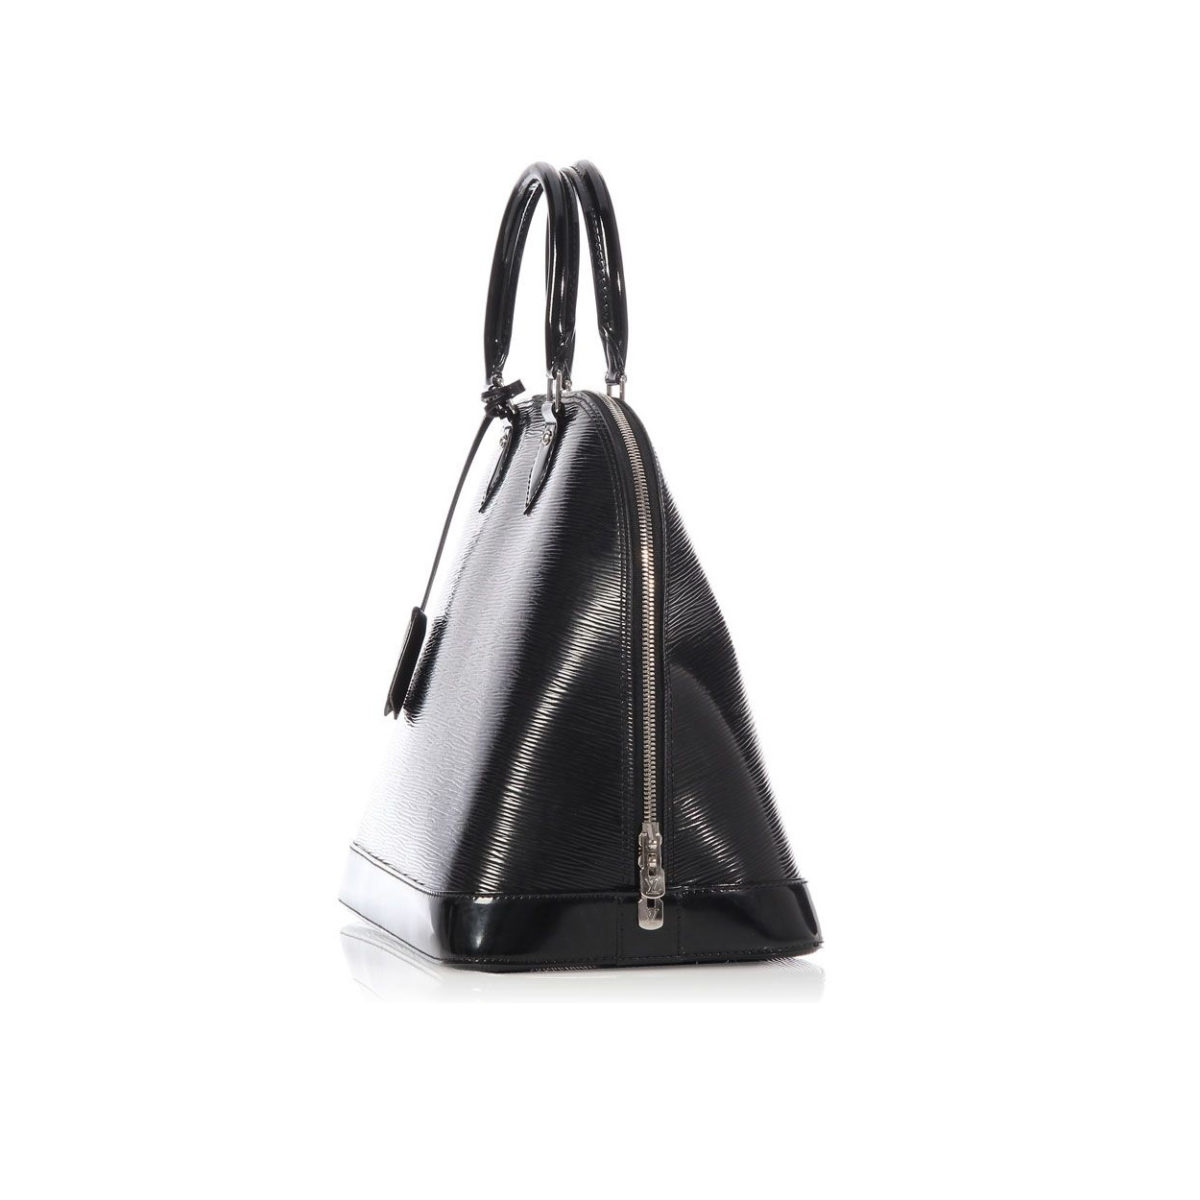 LOUIS VUITTON Electric Epi Alma GM Noir Black - NEW  61b4c744c5d0b